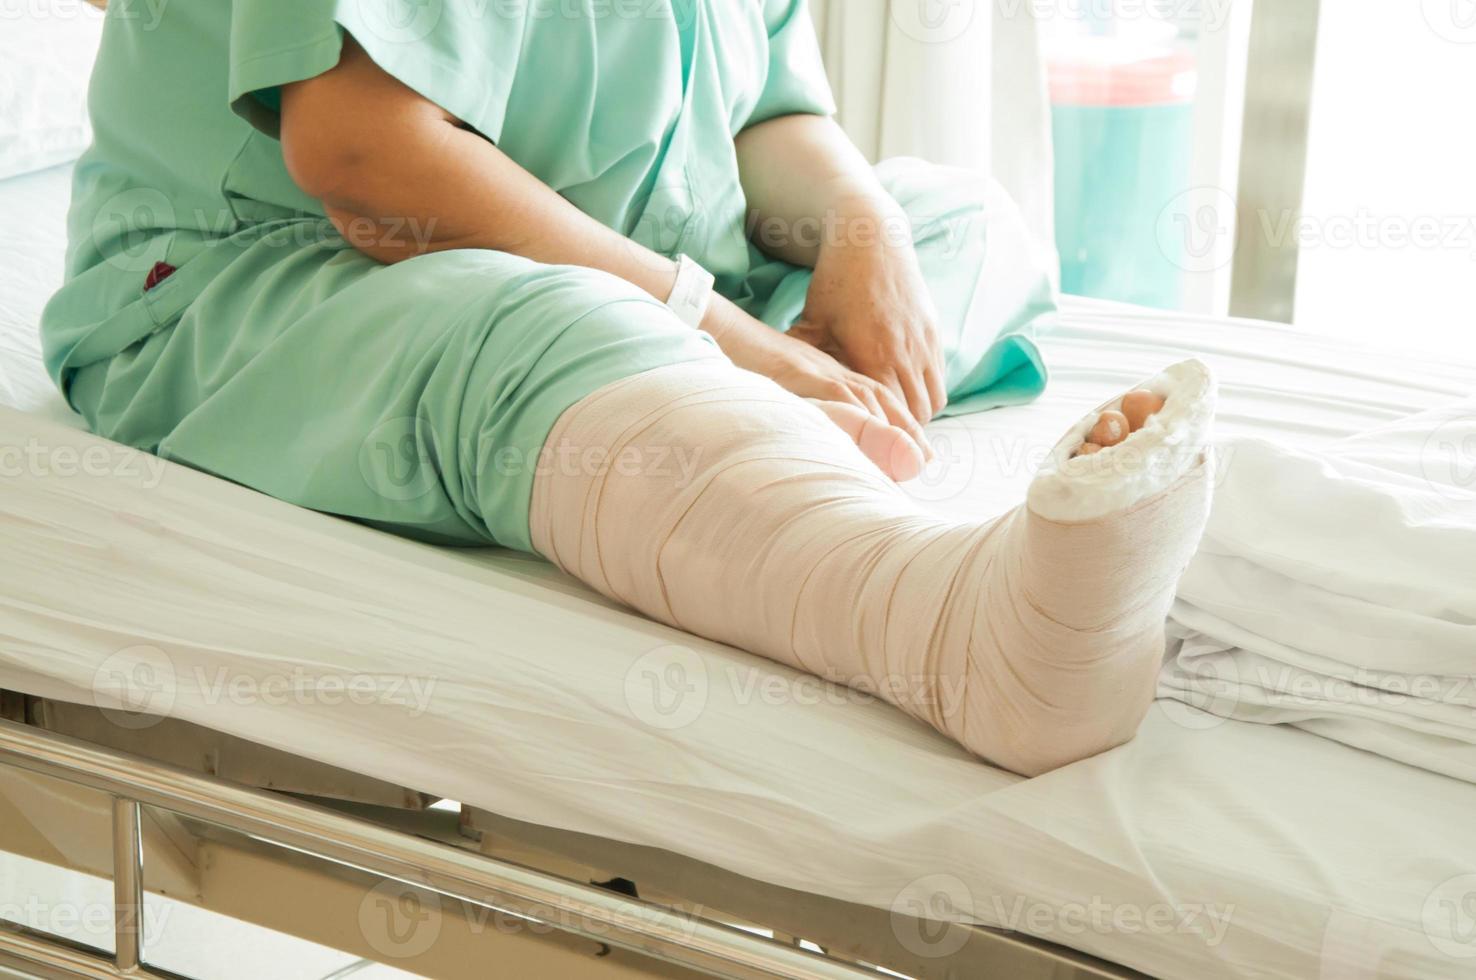 jambe cassée photo